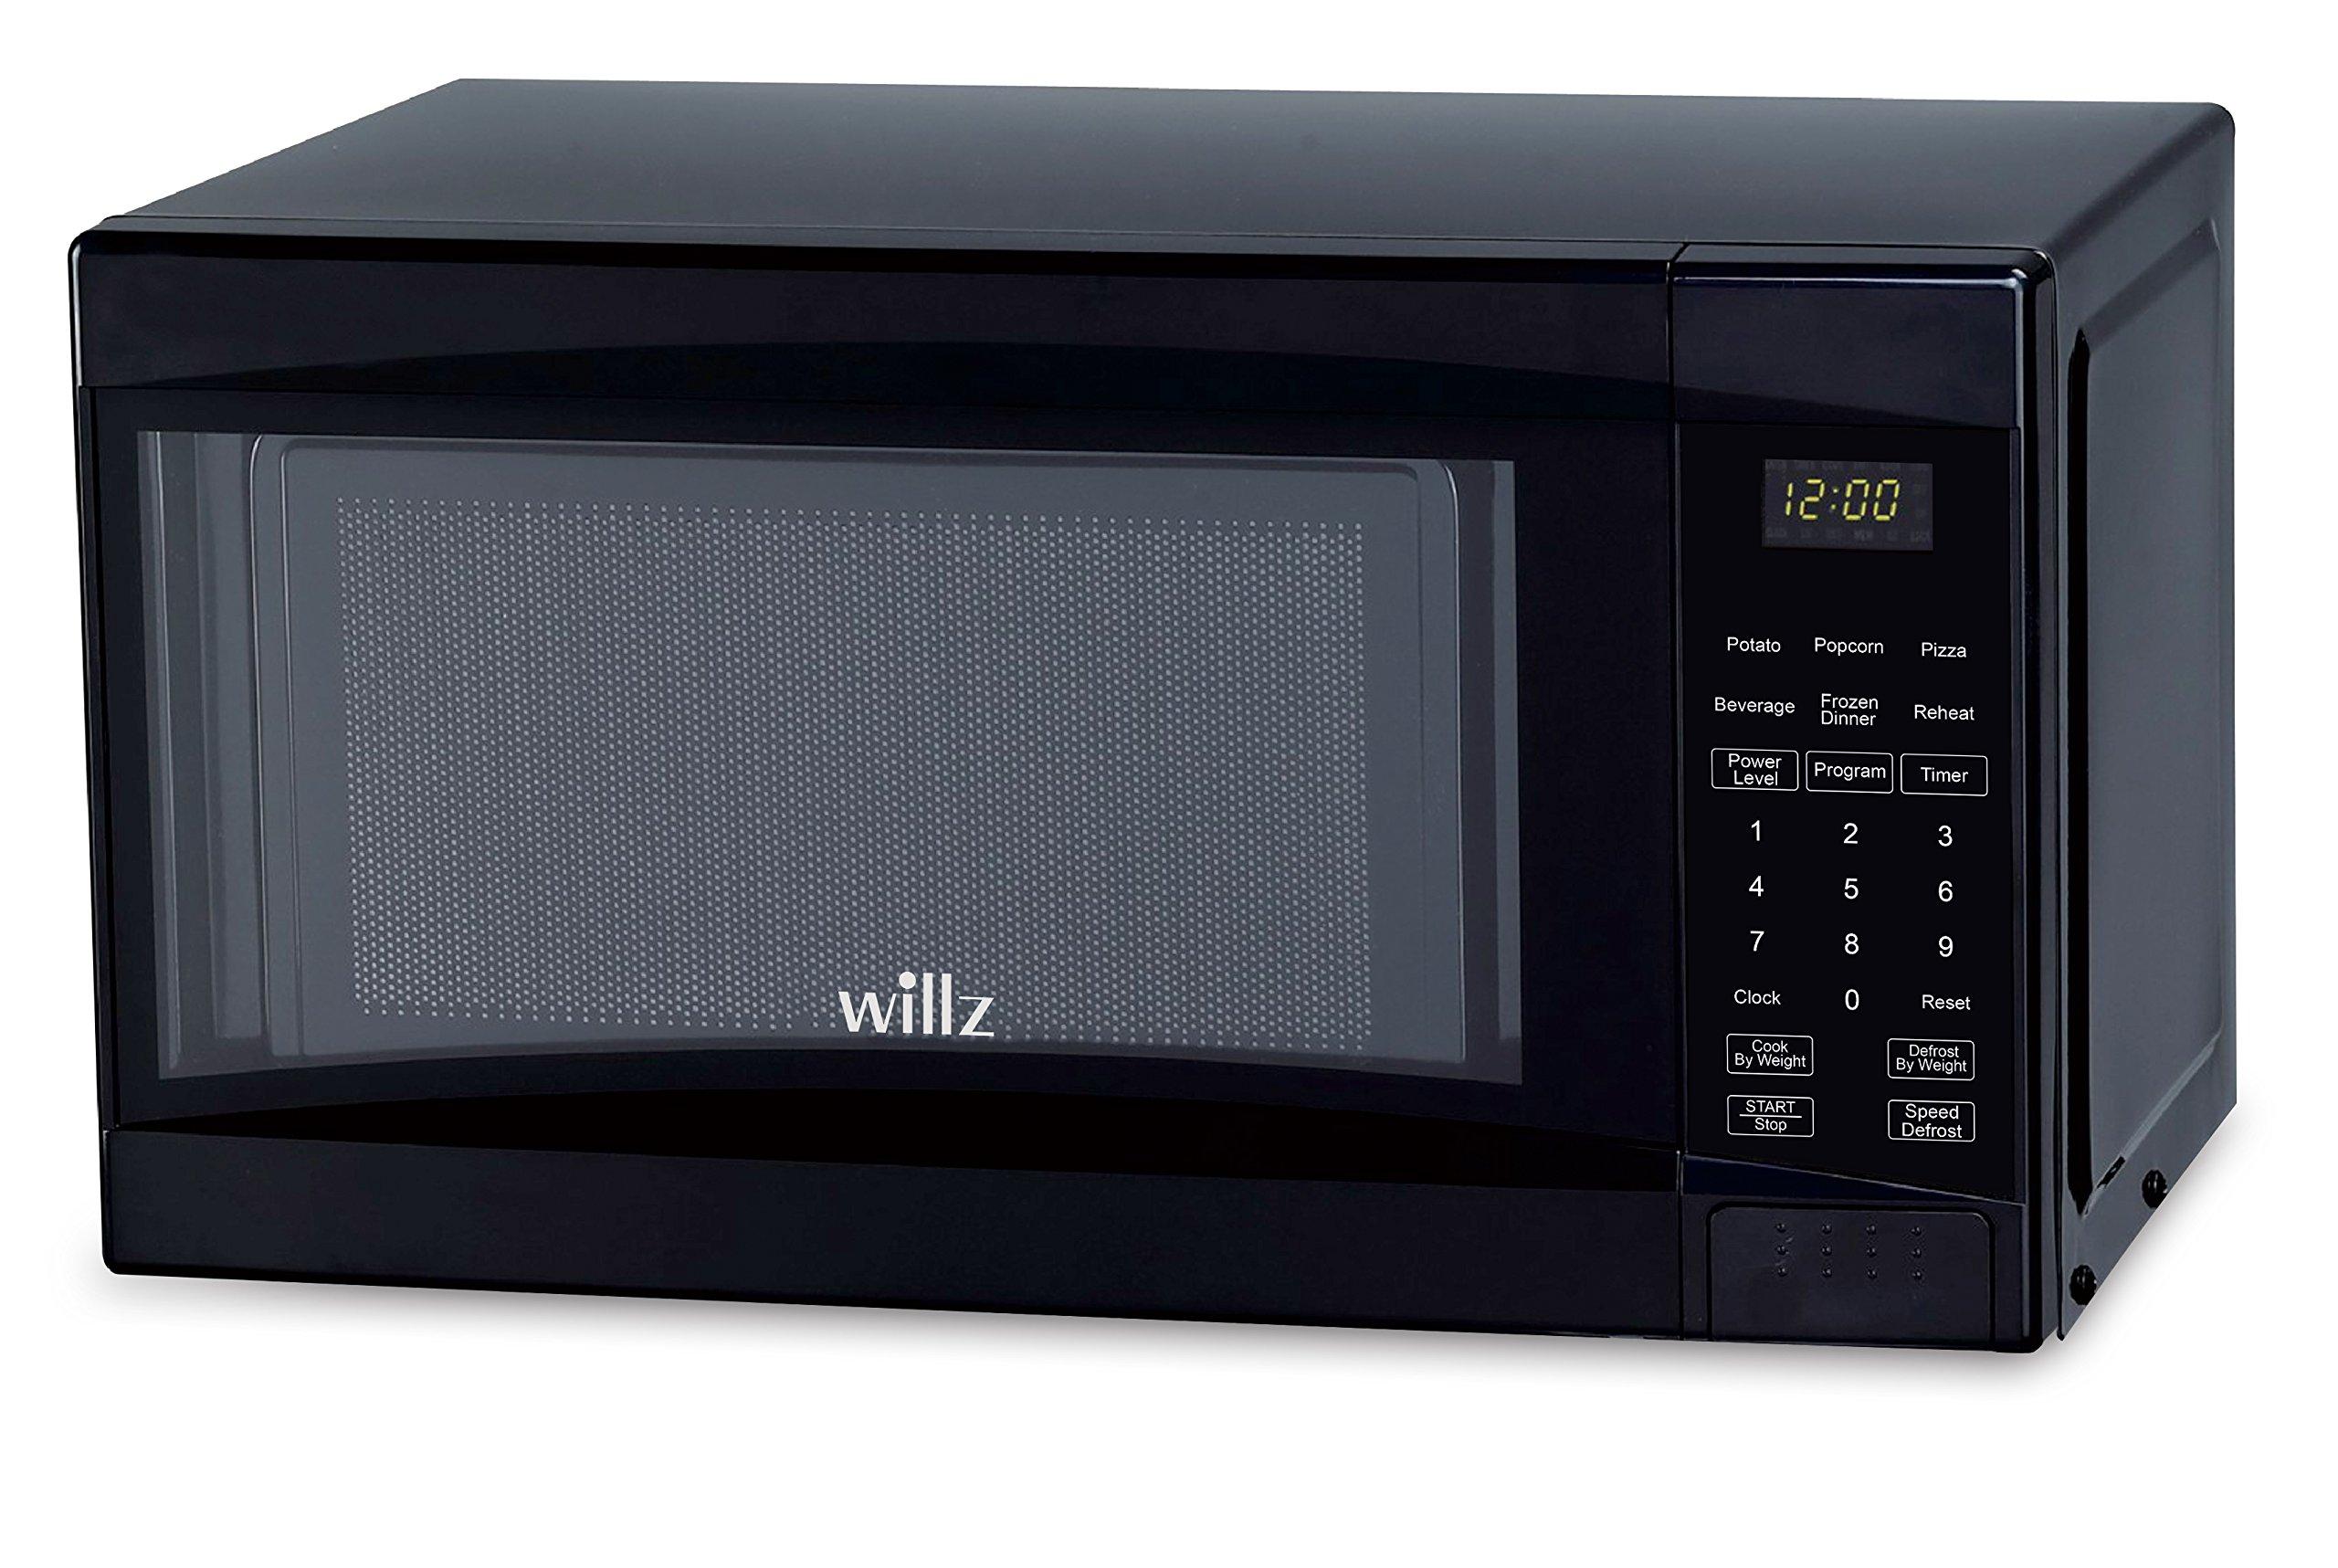 Willz WLCMD207BK-07 1.1 cu ft Black Microwave